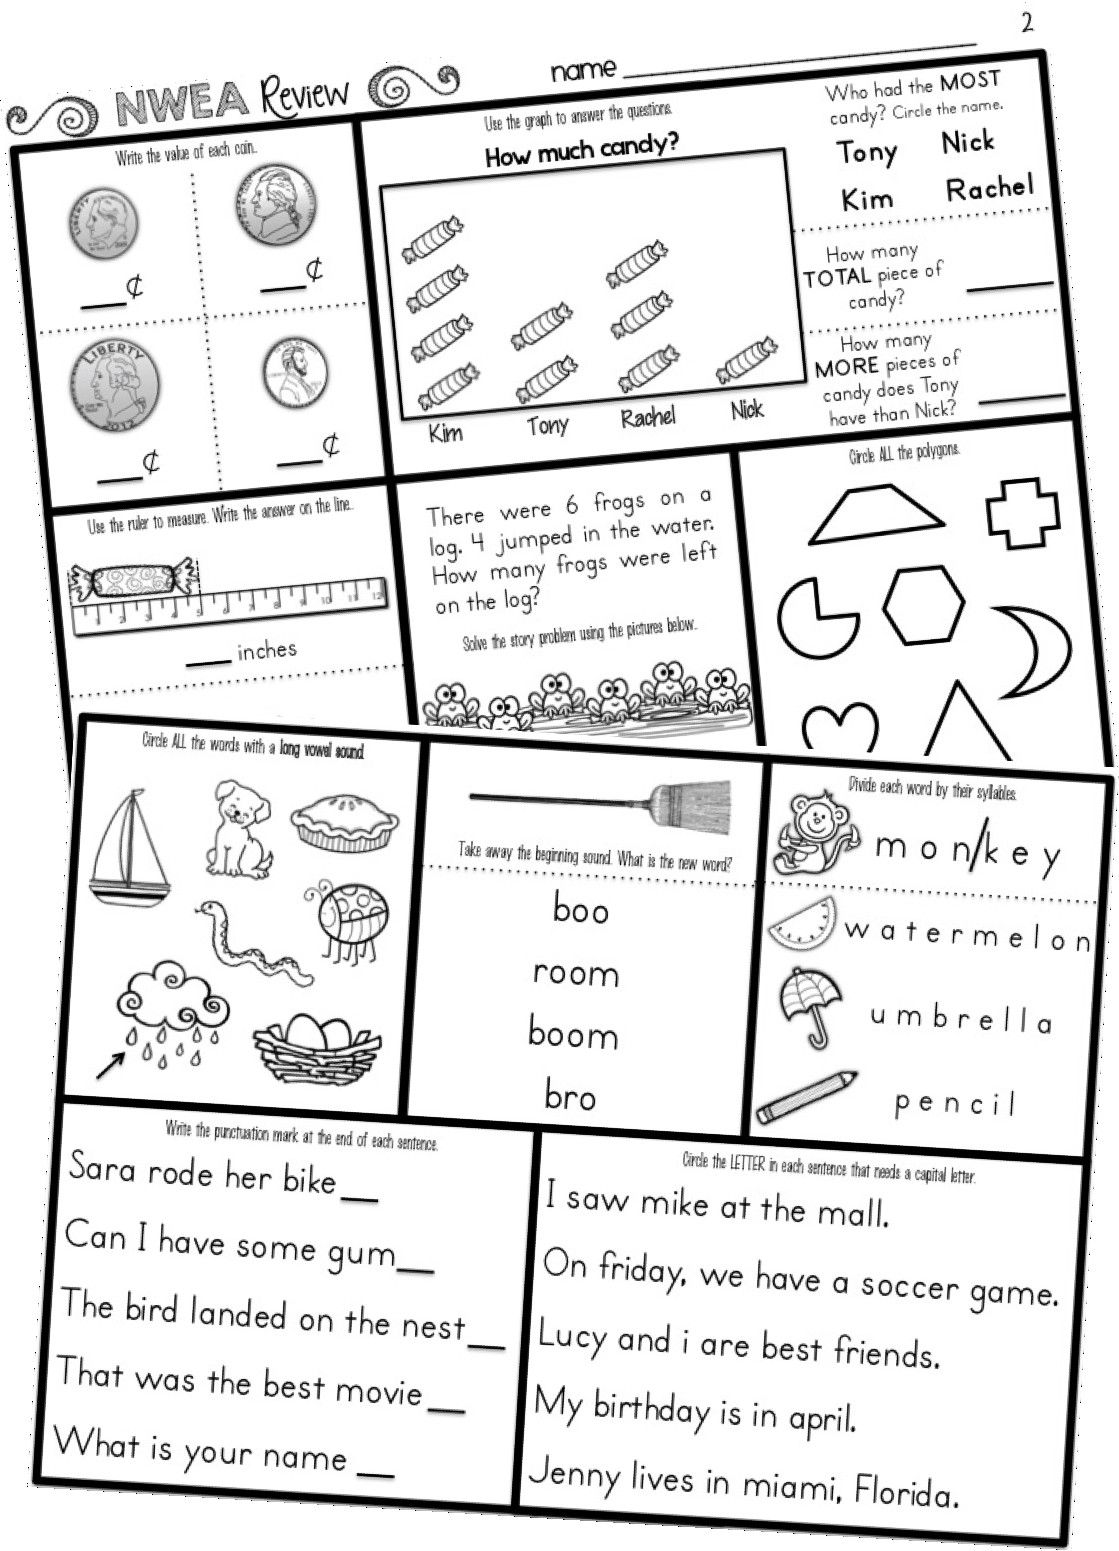 stratagempurple: 5th grade math mon core practice test